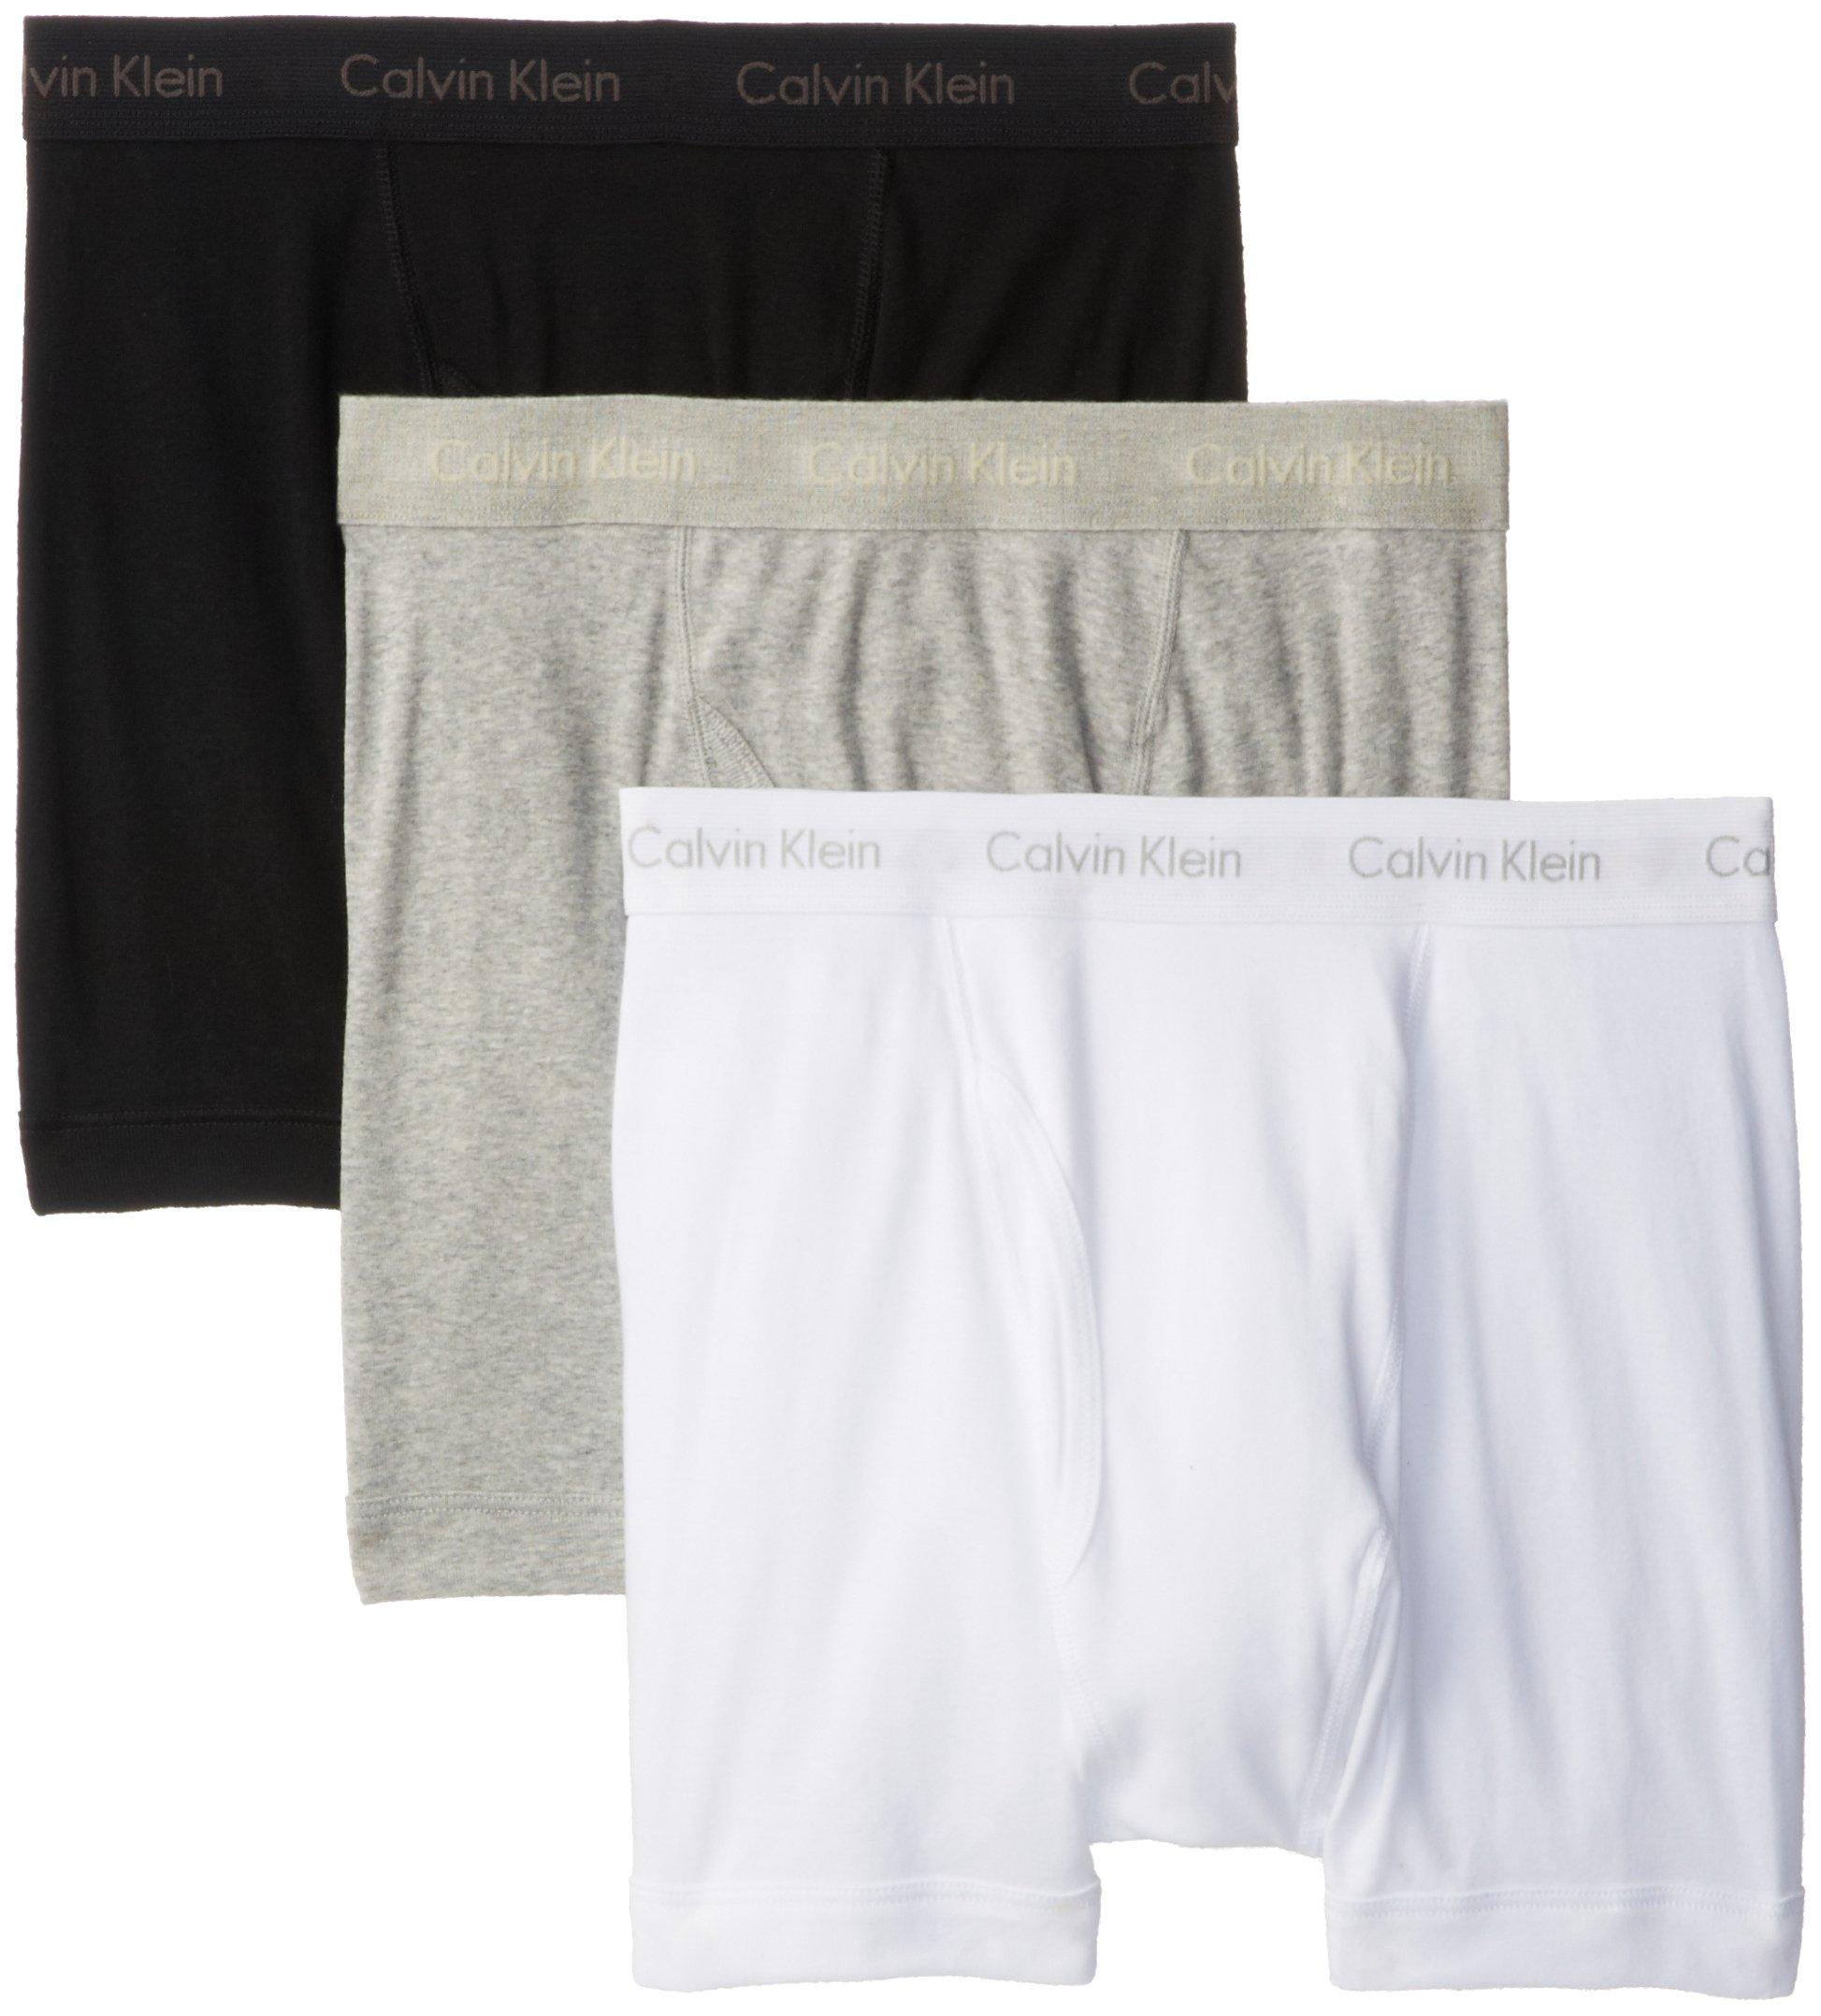 Calvin Klein Men's Underwear Cotton Classics Boxer Briefs - Large - White/Black/Grey (Pack of 3)